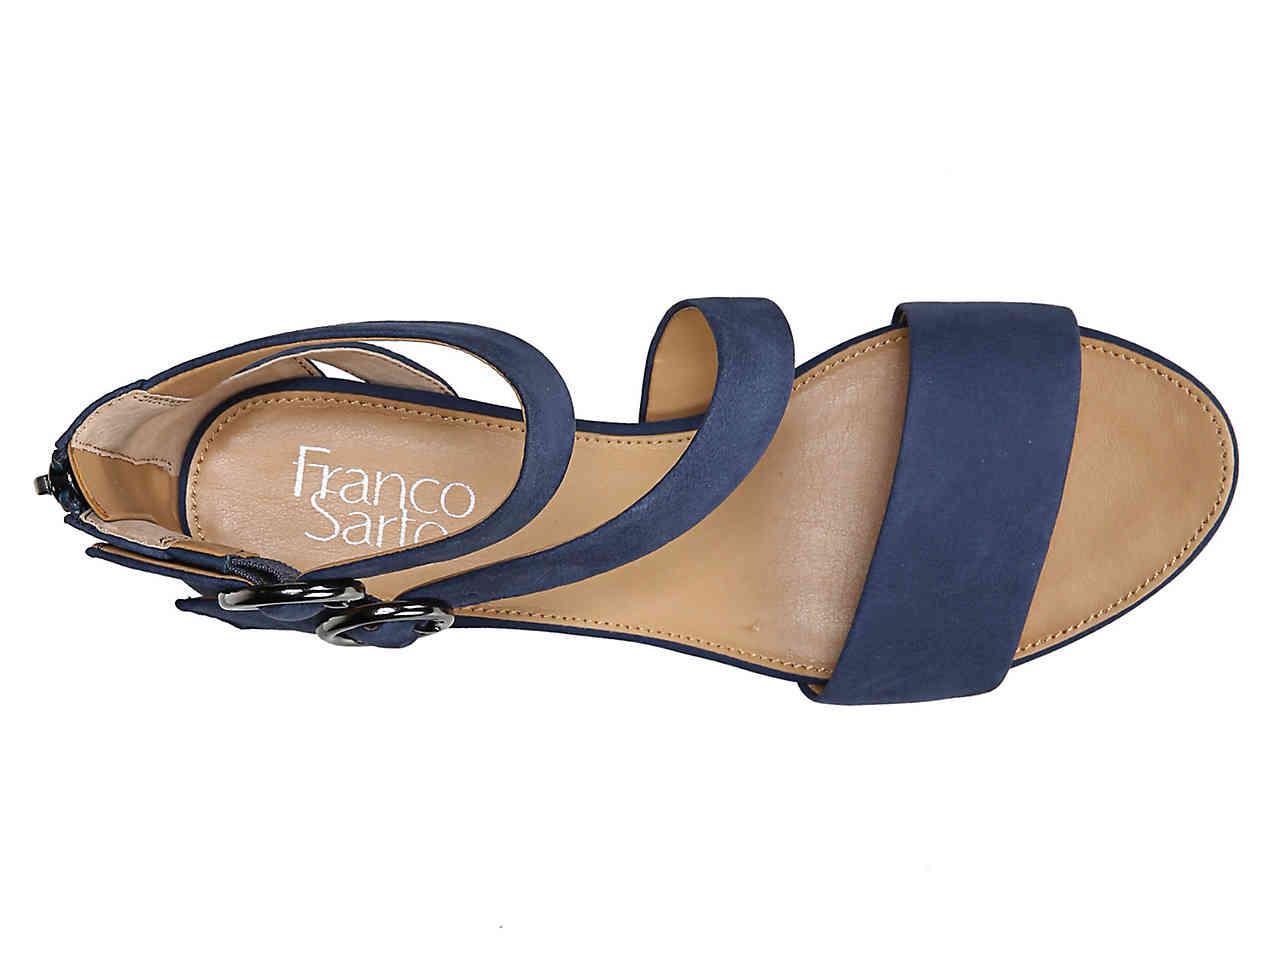 a14ba2945fe Lyst - Franco Sarto Derek Wedge Sandal in Blue